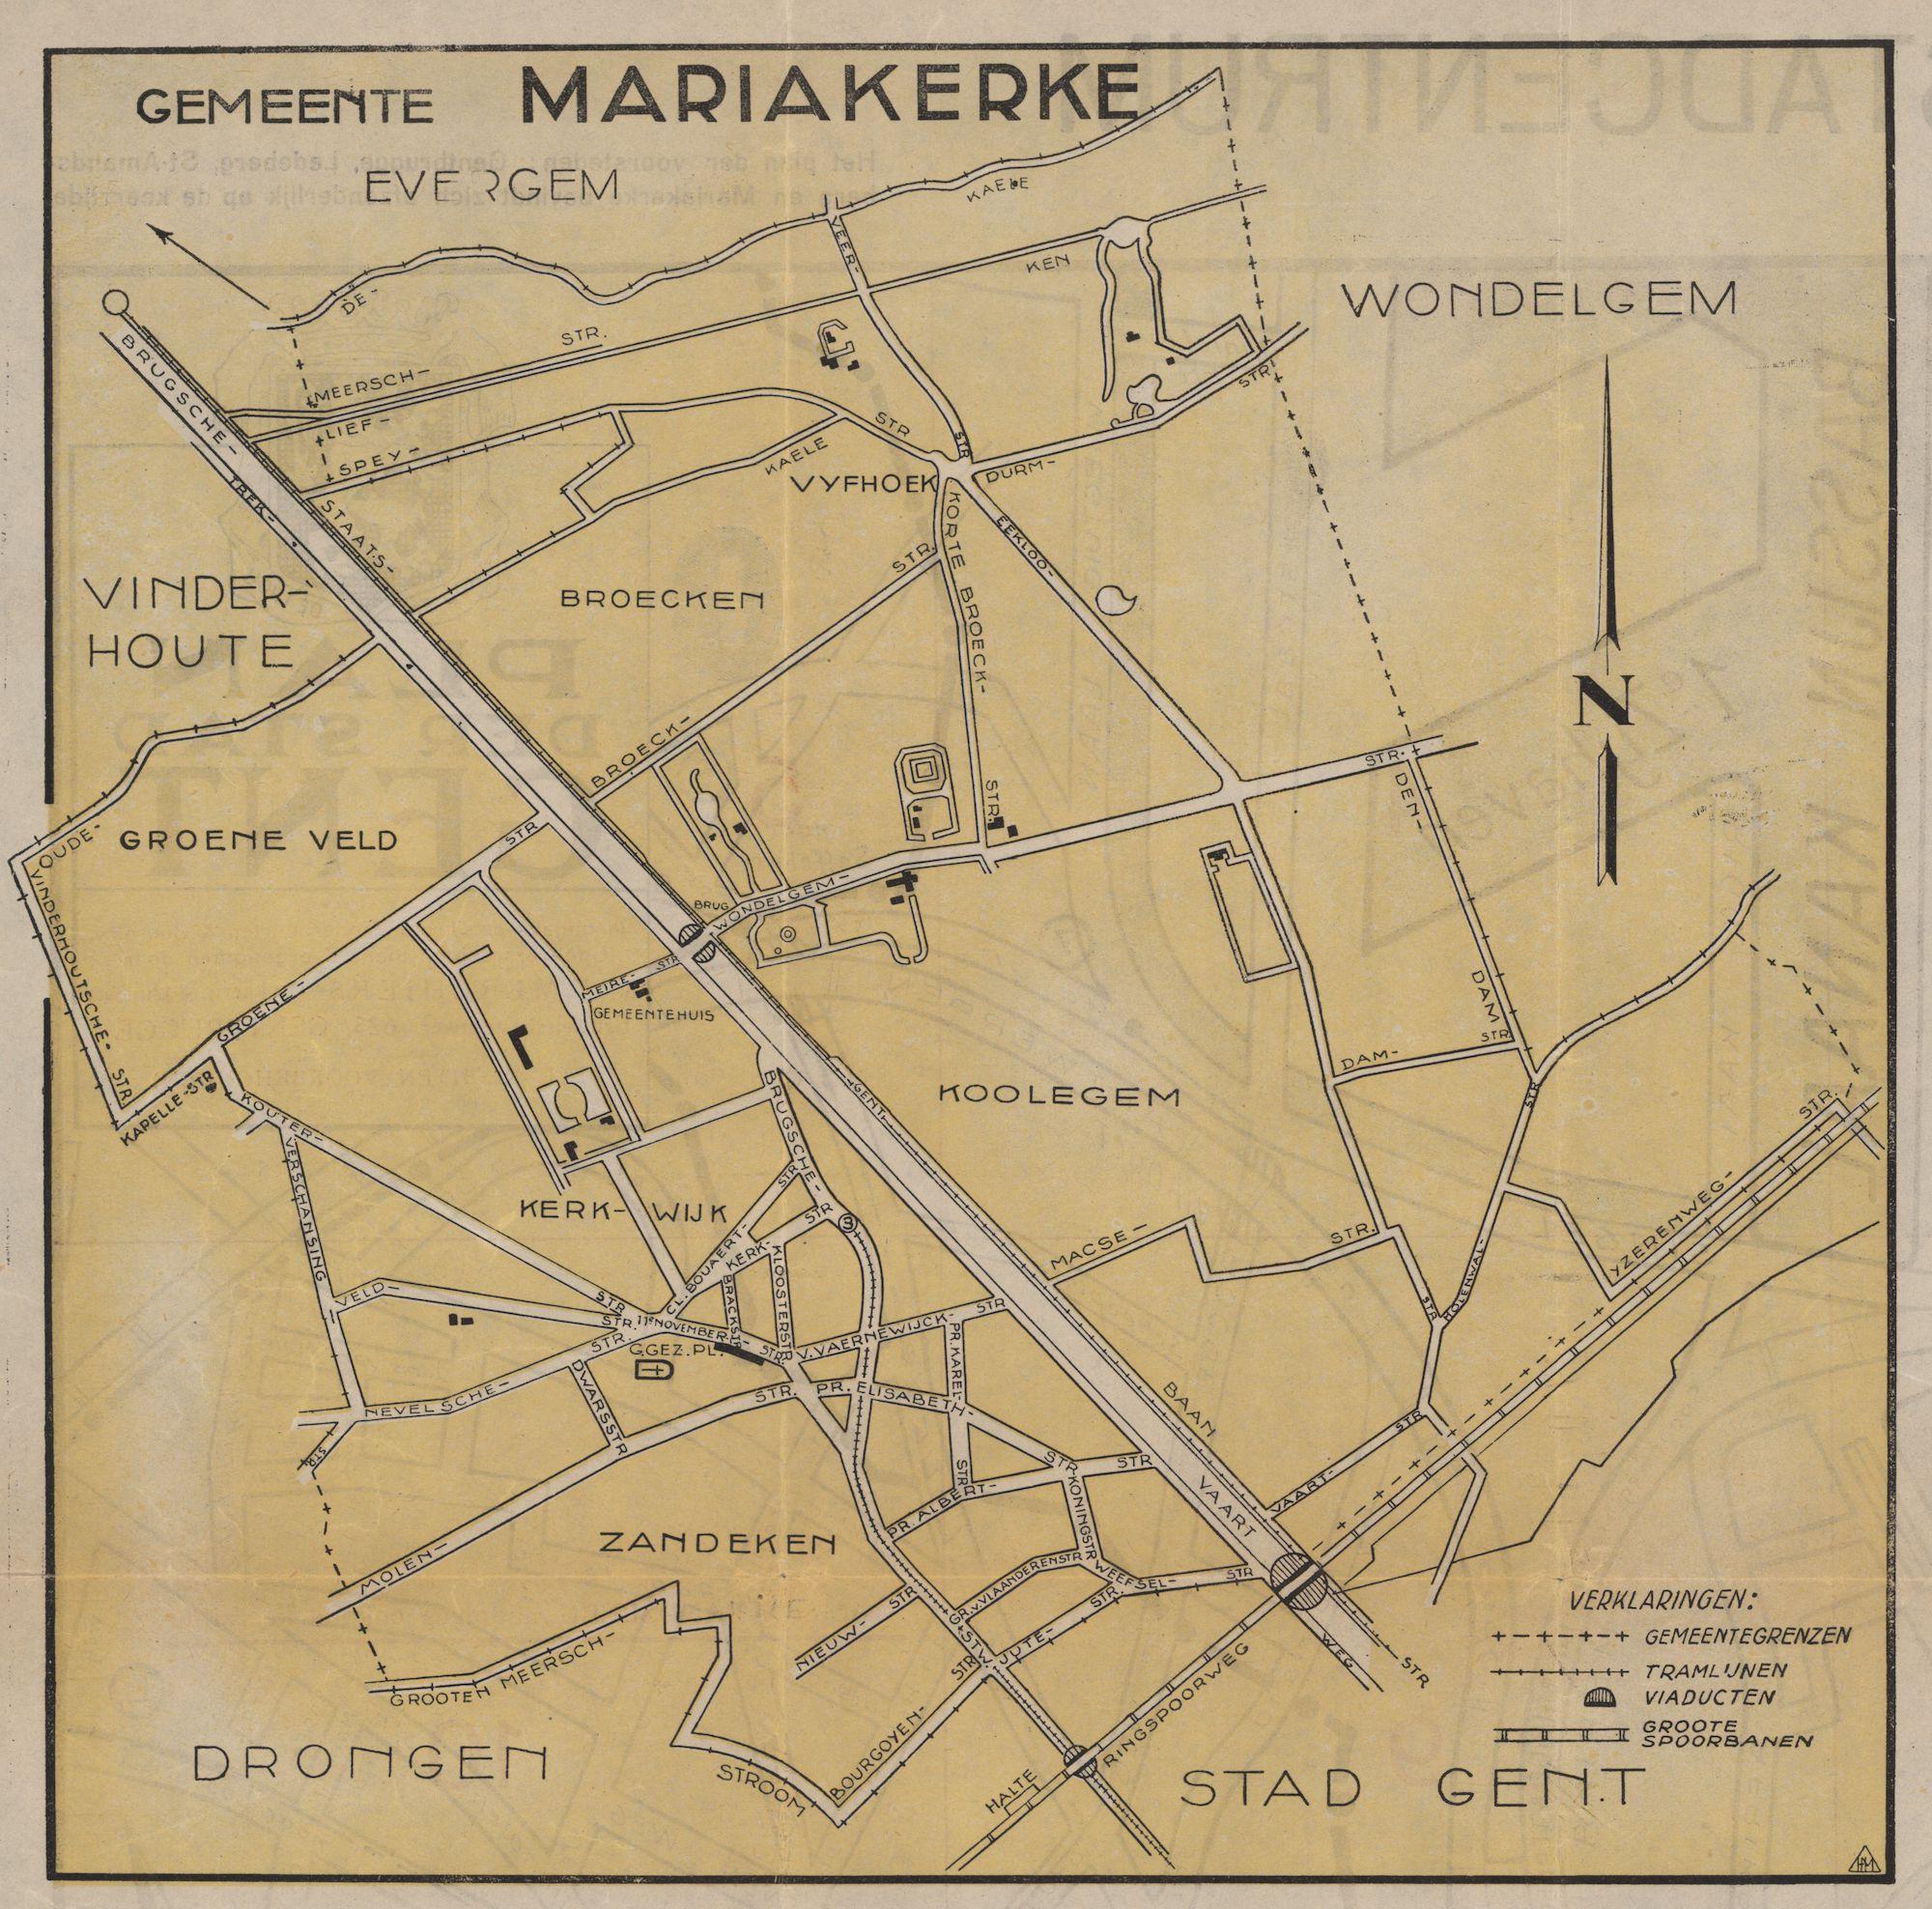 Kaart van de gemeente Mariakerke, c.1950